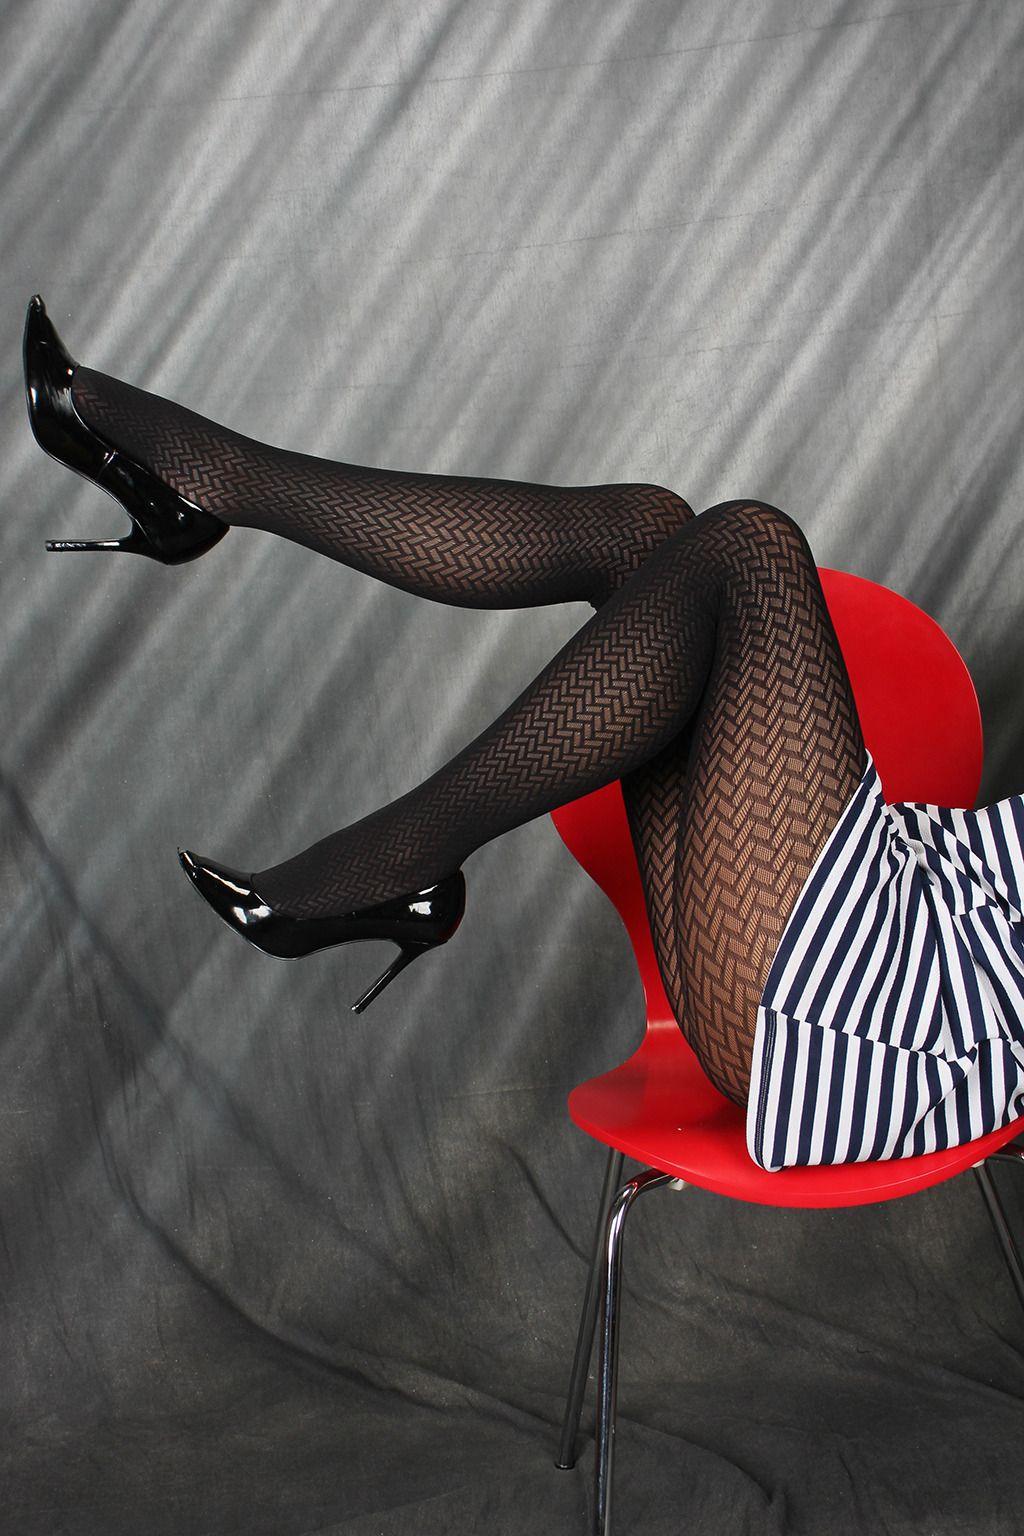 John Radford S Tights Pantyhose Pics Skirt Heels Tights Pantyhose